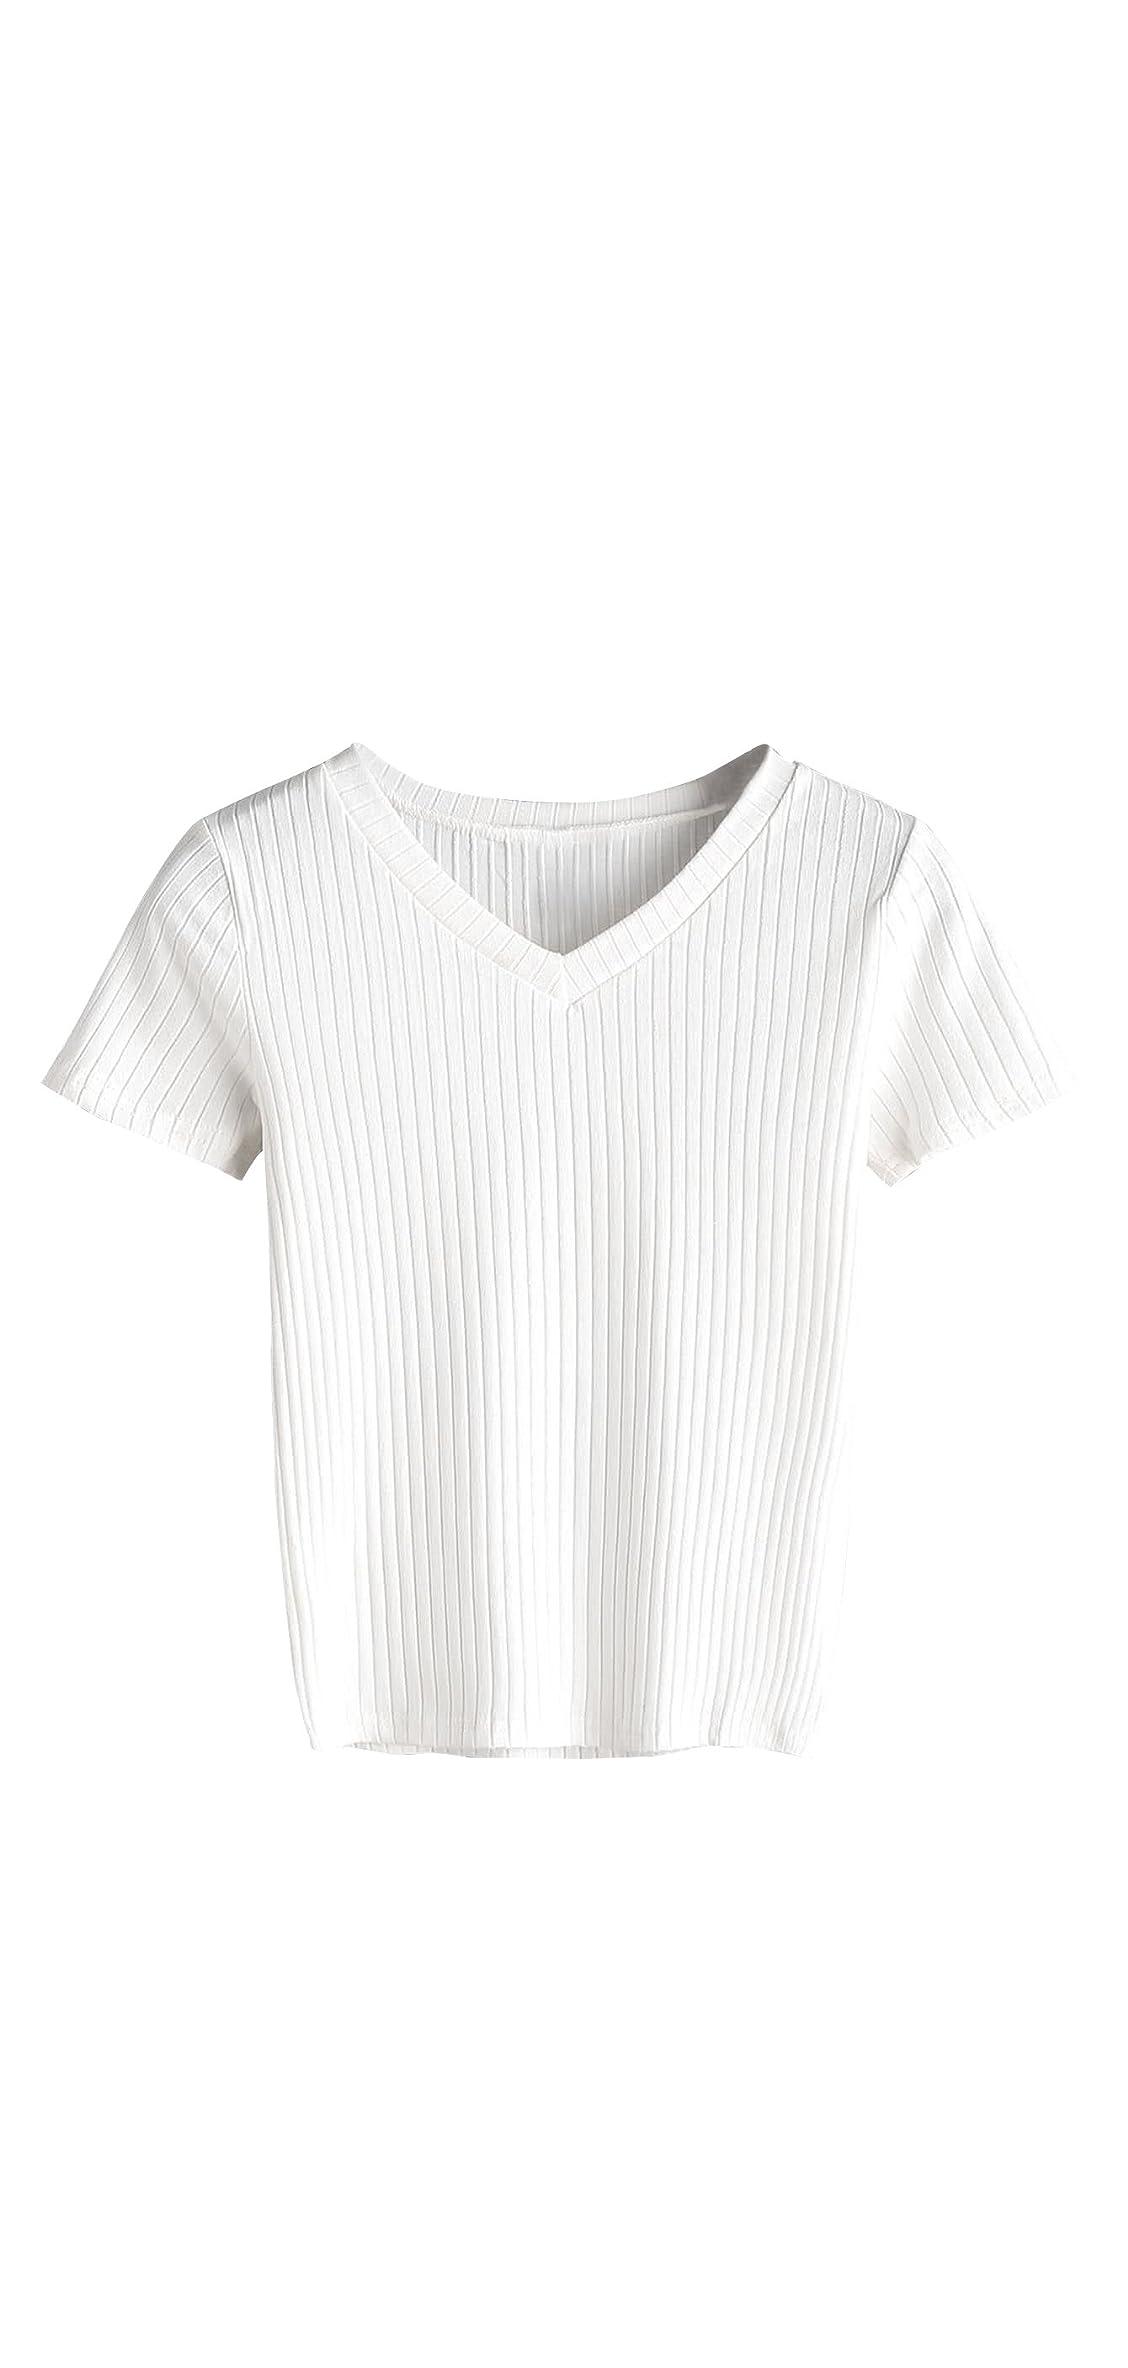 Women's Basic Short Sleeve V Neck Ribbed Knit Crop